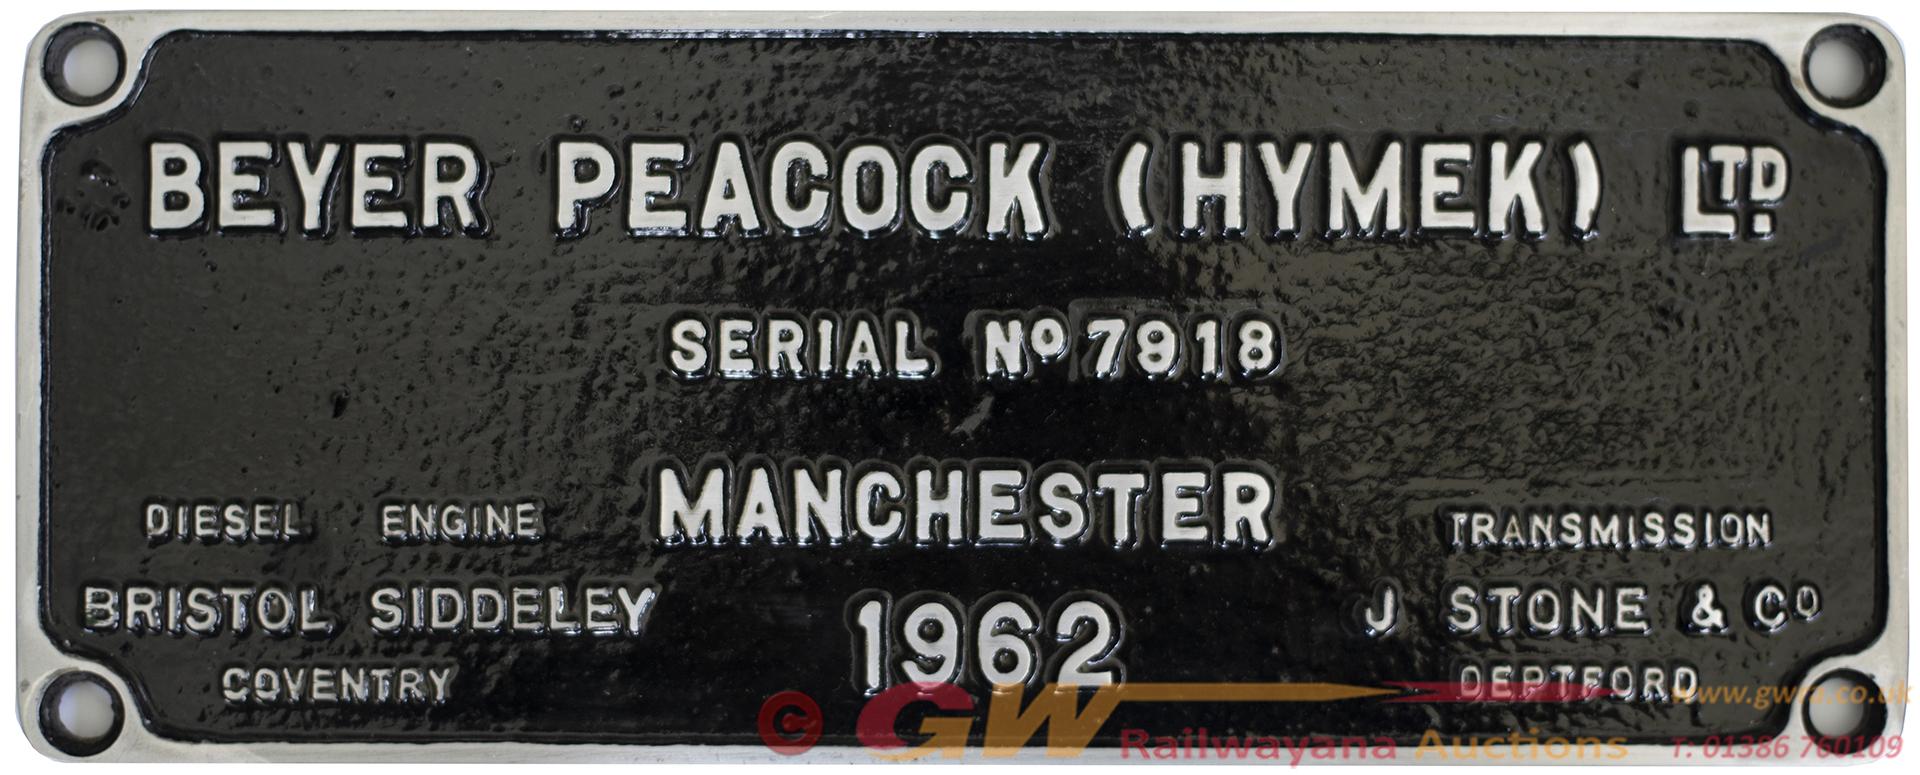 Worksplate BEYER PEACOCK (HYMEK) LTD MANCHESTER